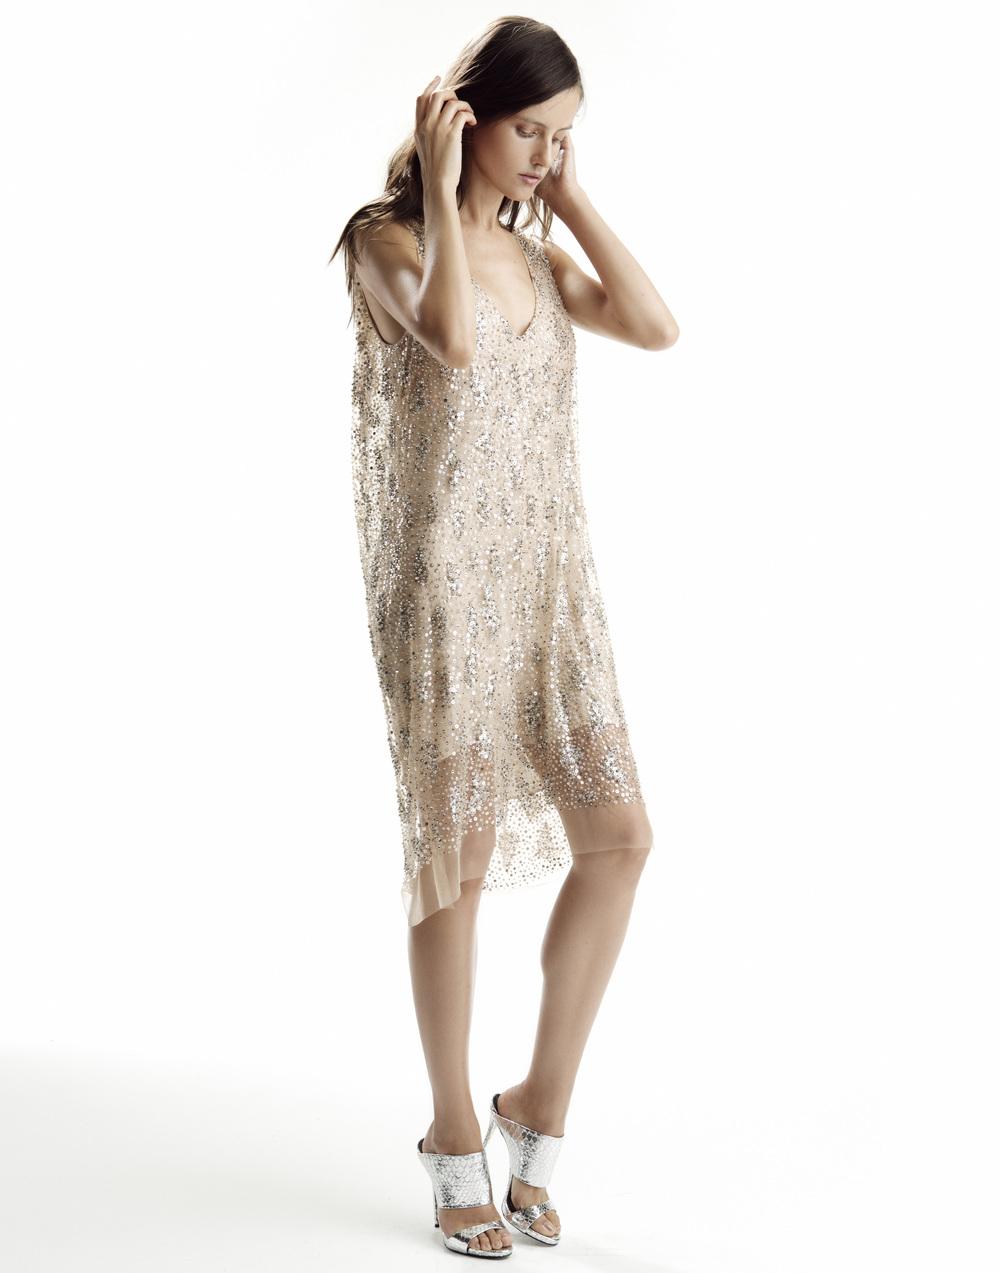 Rita VInieris SS 2015 - look # 4.jpg